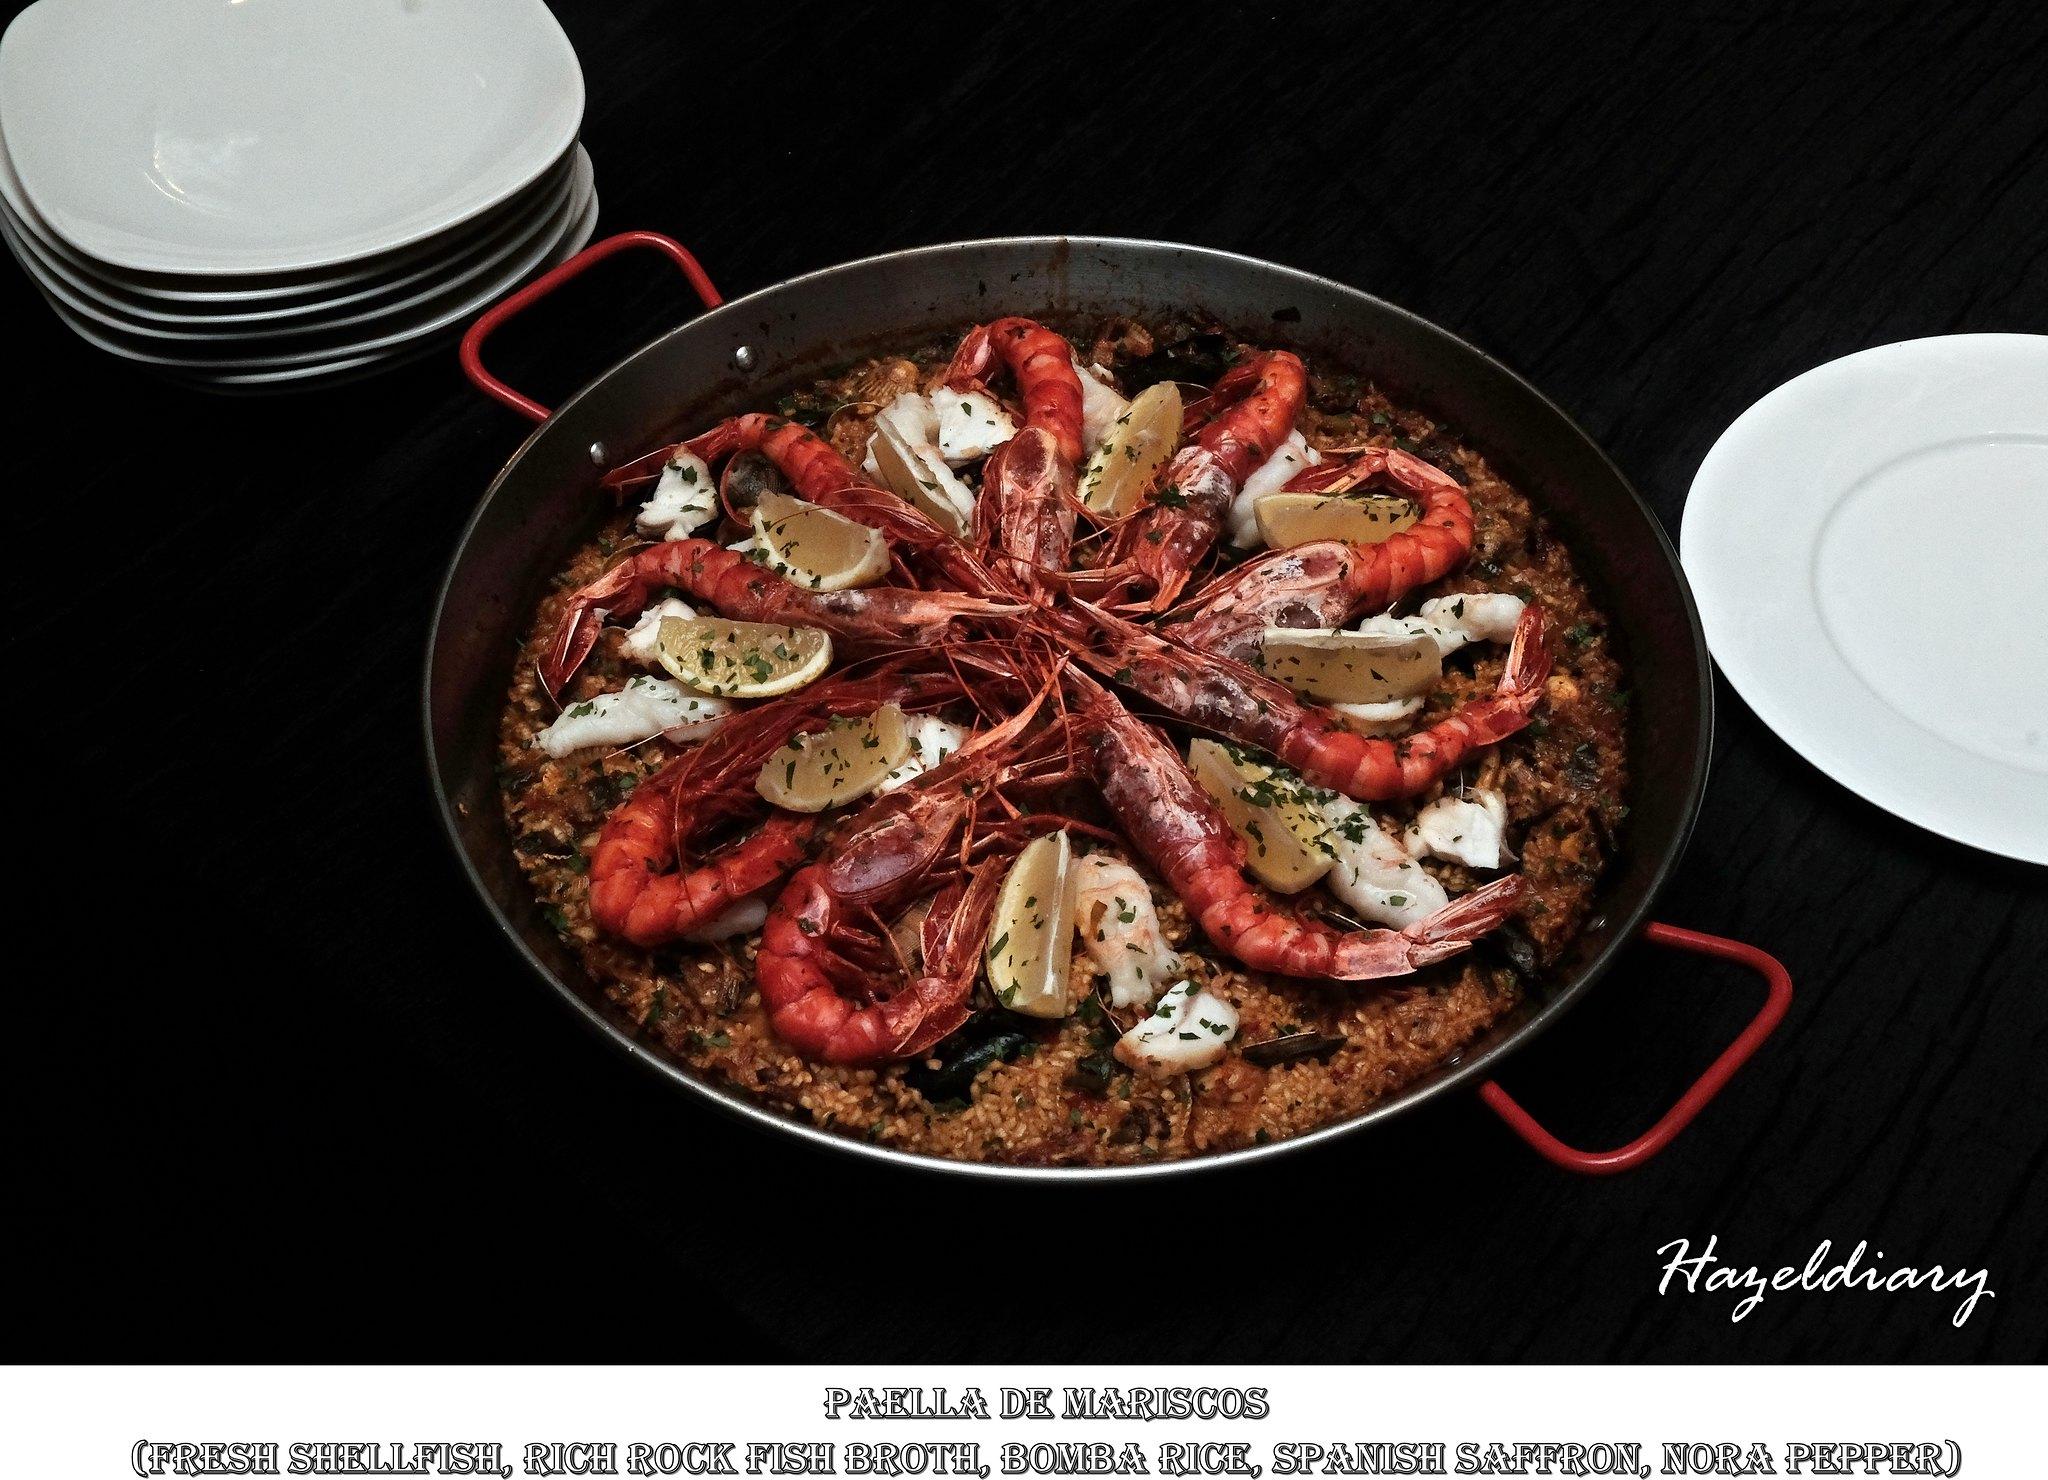 Capella The Knolls-Spanish Gourmet-Paella-Hazeldiary